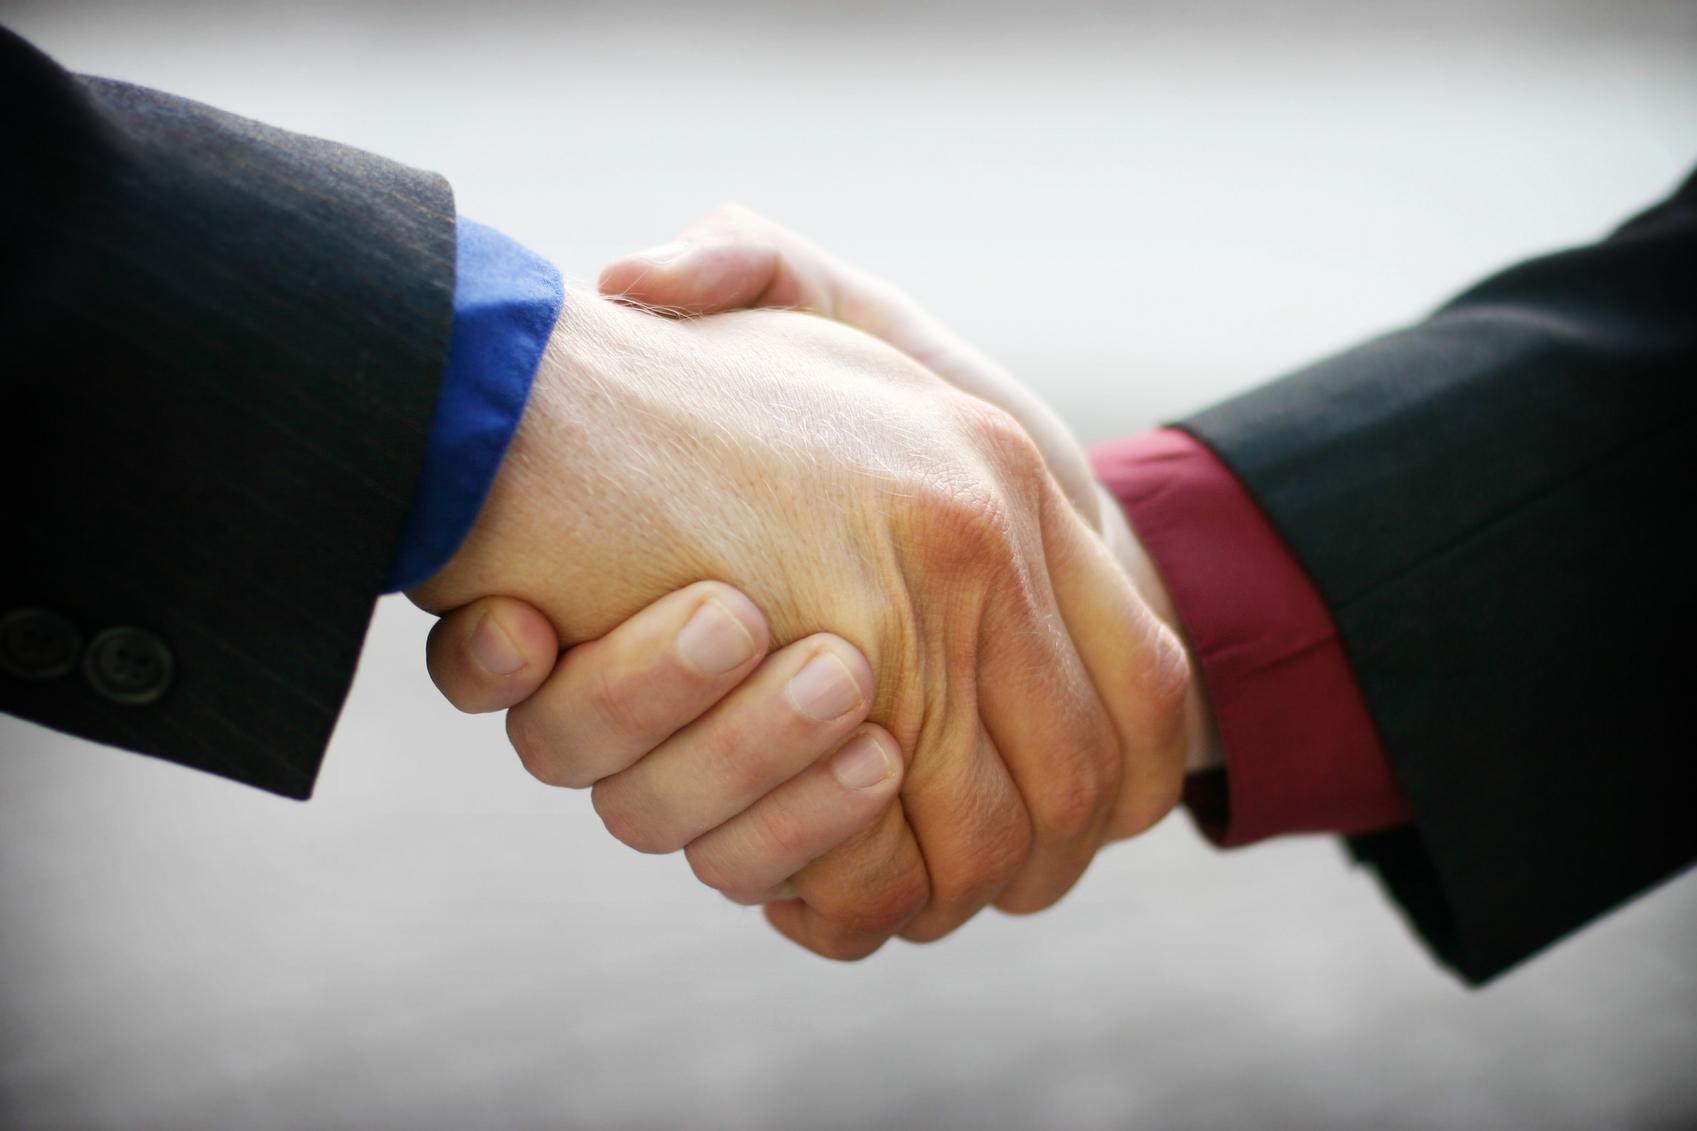 Nevoia de parteneriat